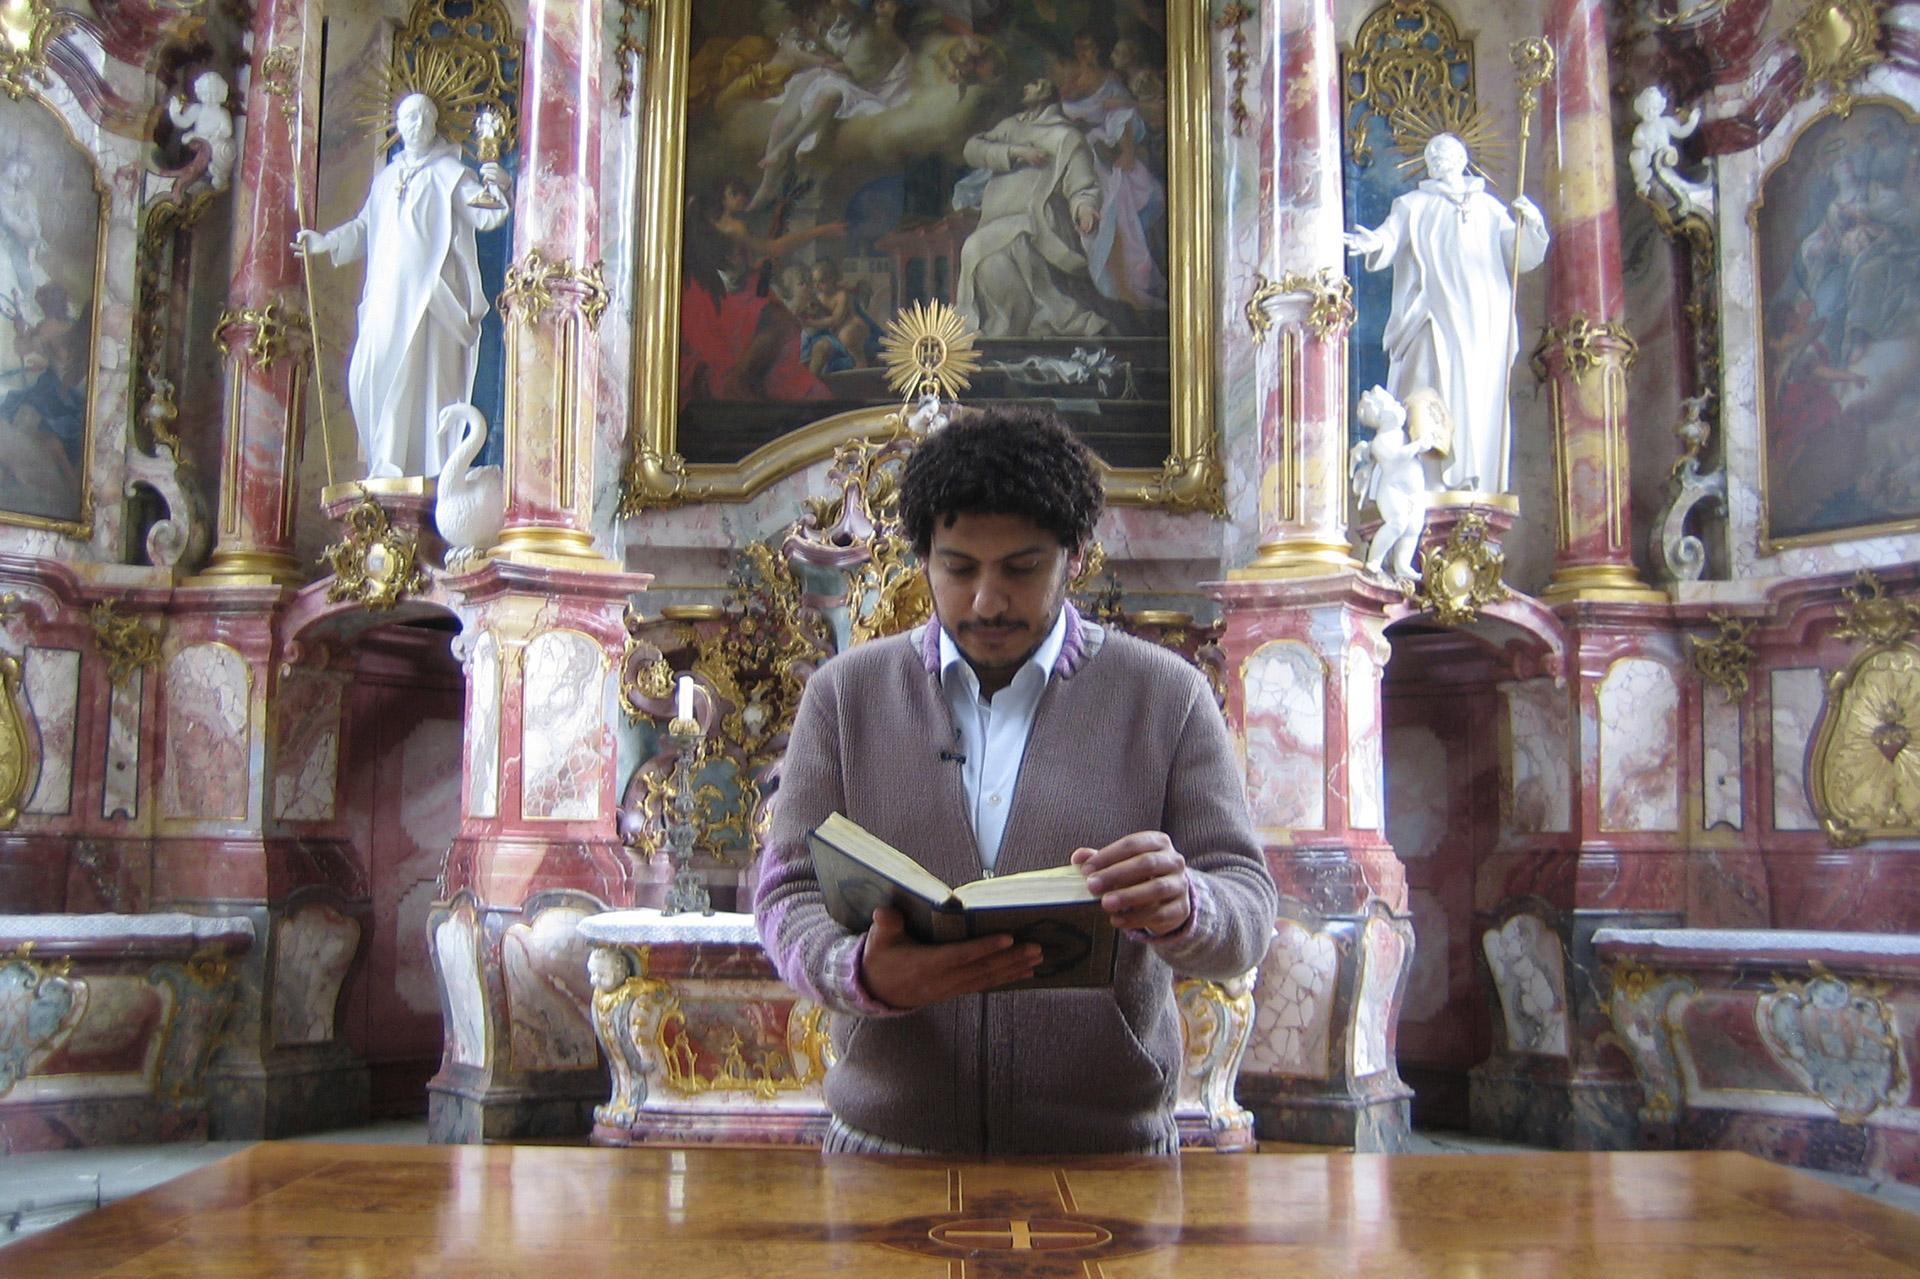 Wael-Shawky-Kunsthalle-Winterthur-2007-4.jpg